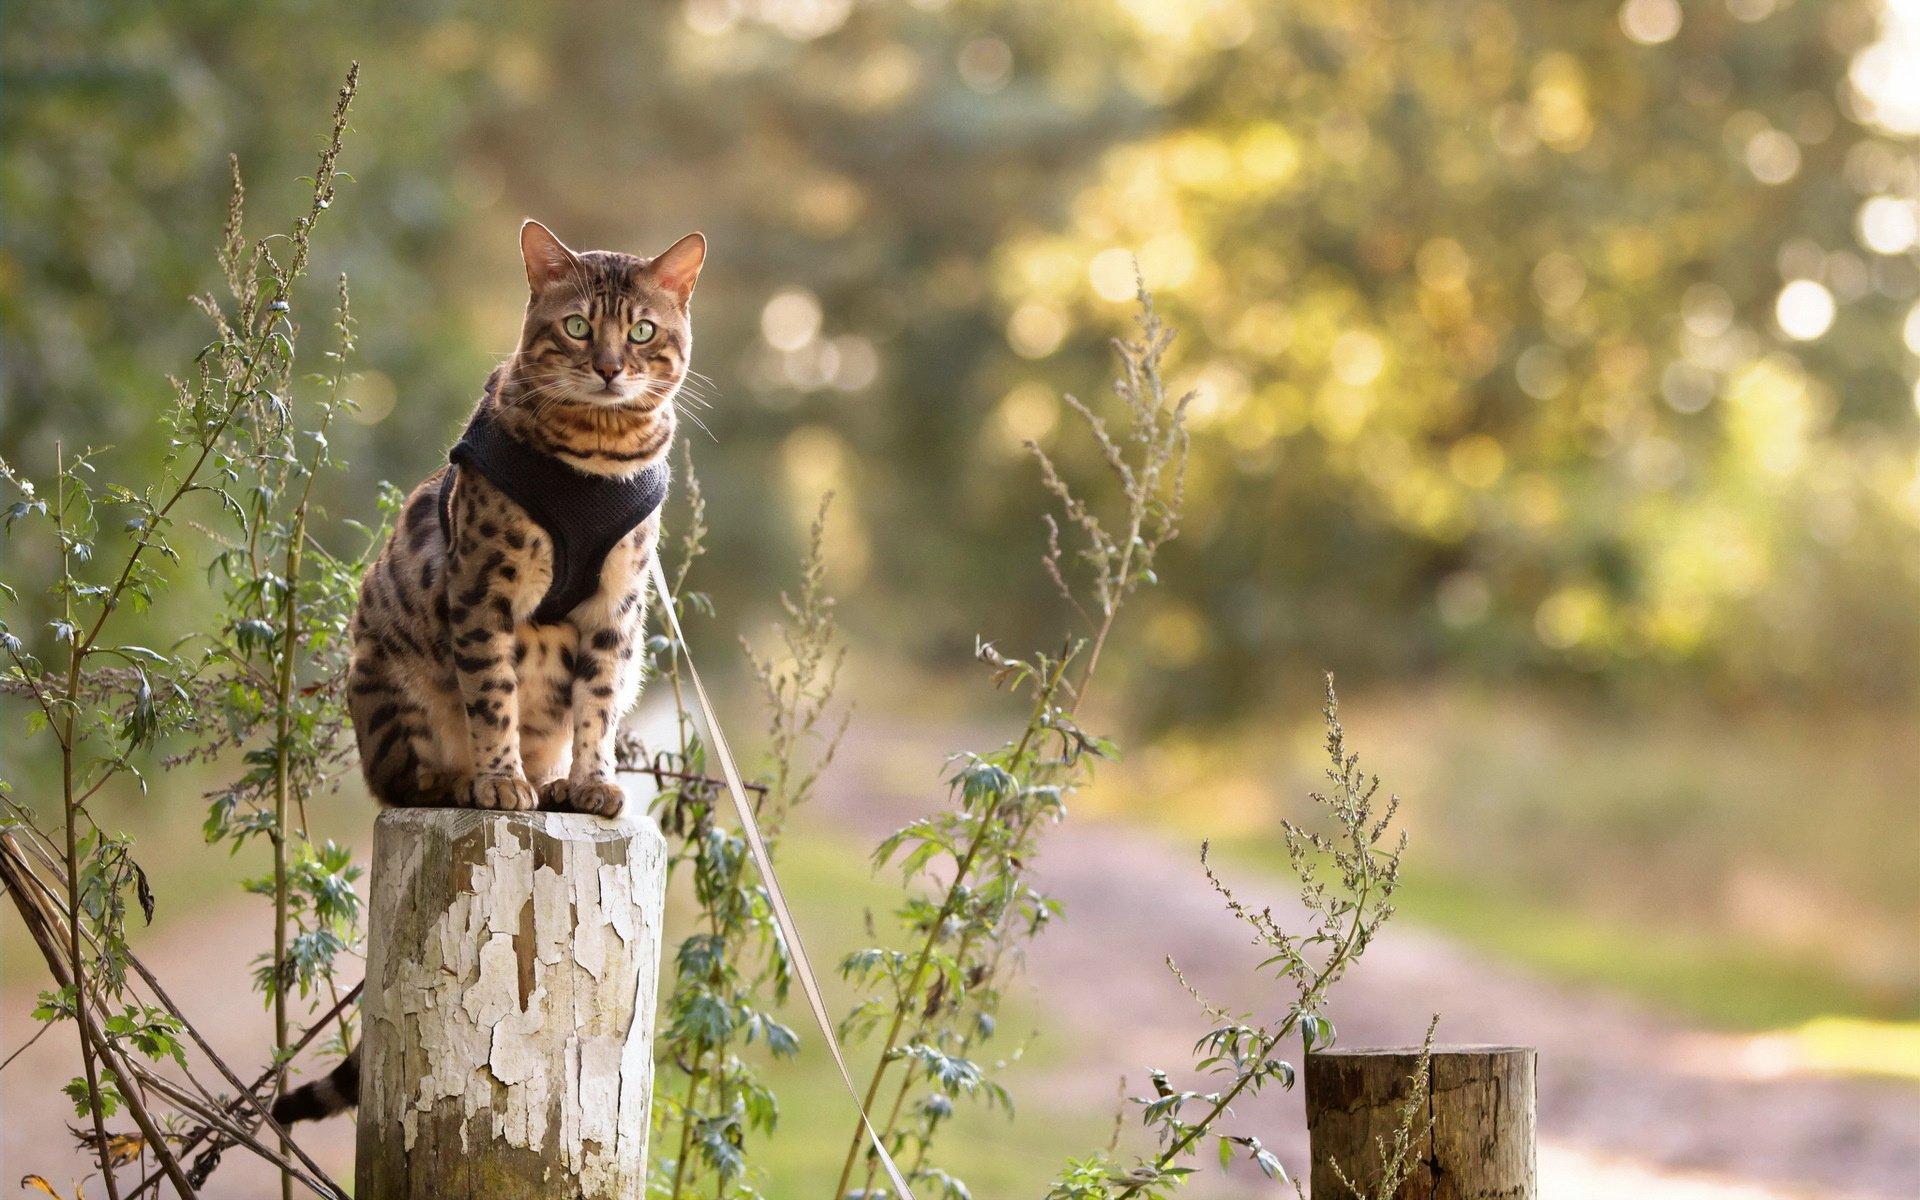 хотите картинки высокого разрешения котик на плече сидит семь